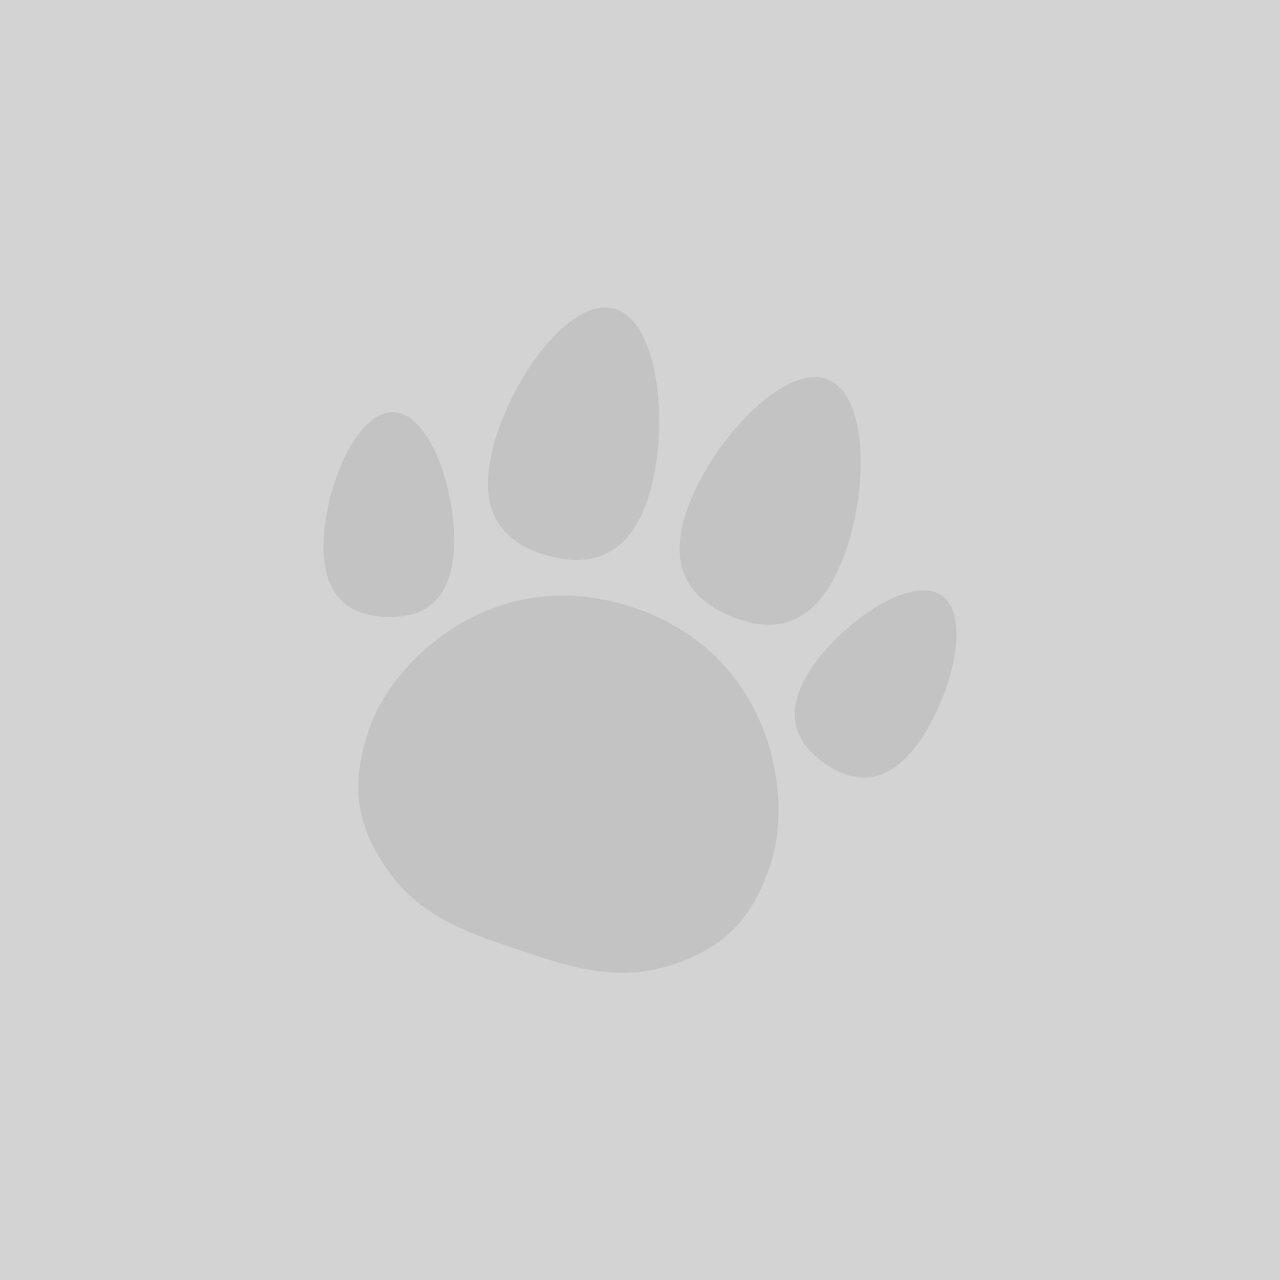 James & Steel Doggie Bubble Manual Gun Toy